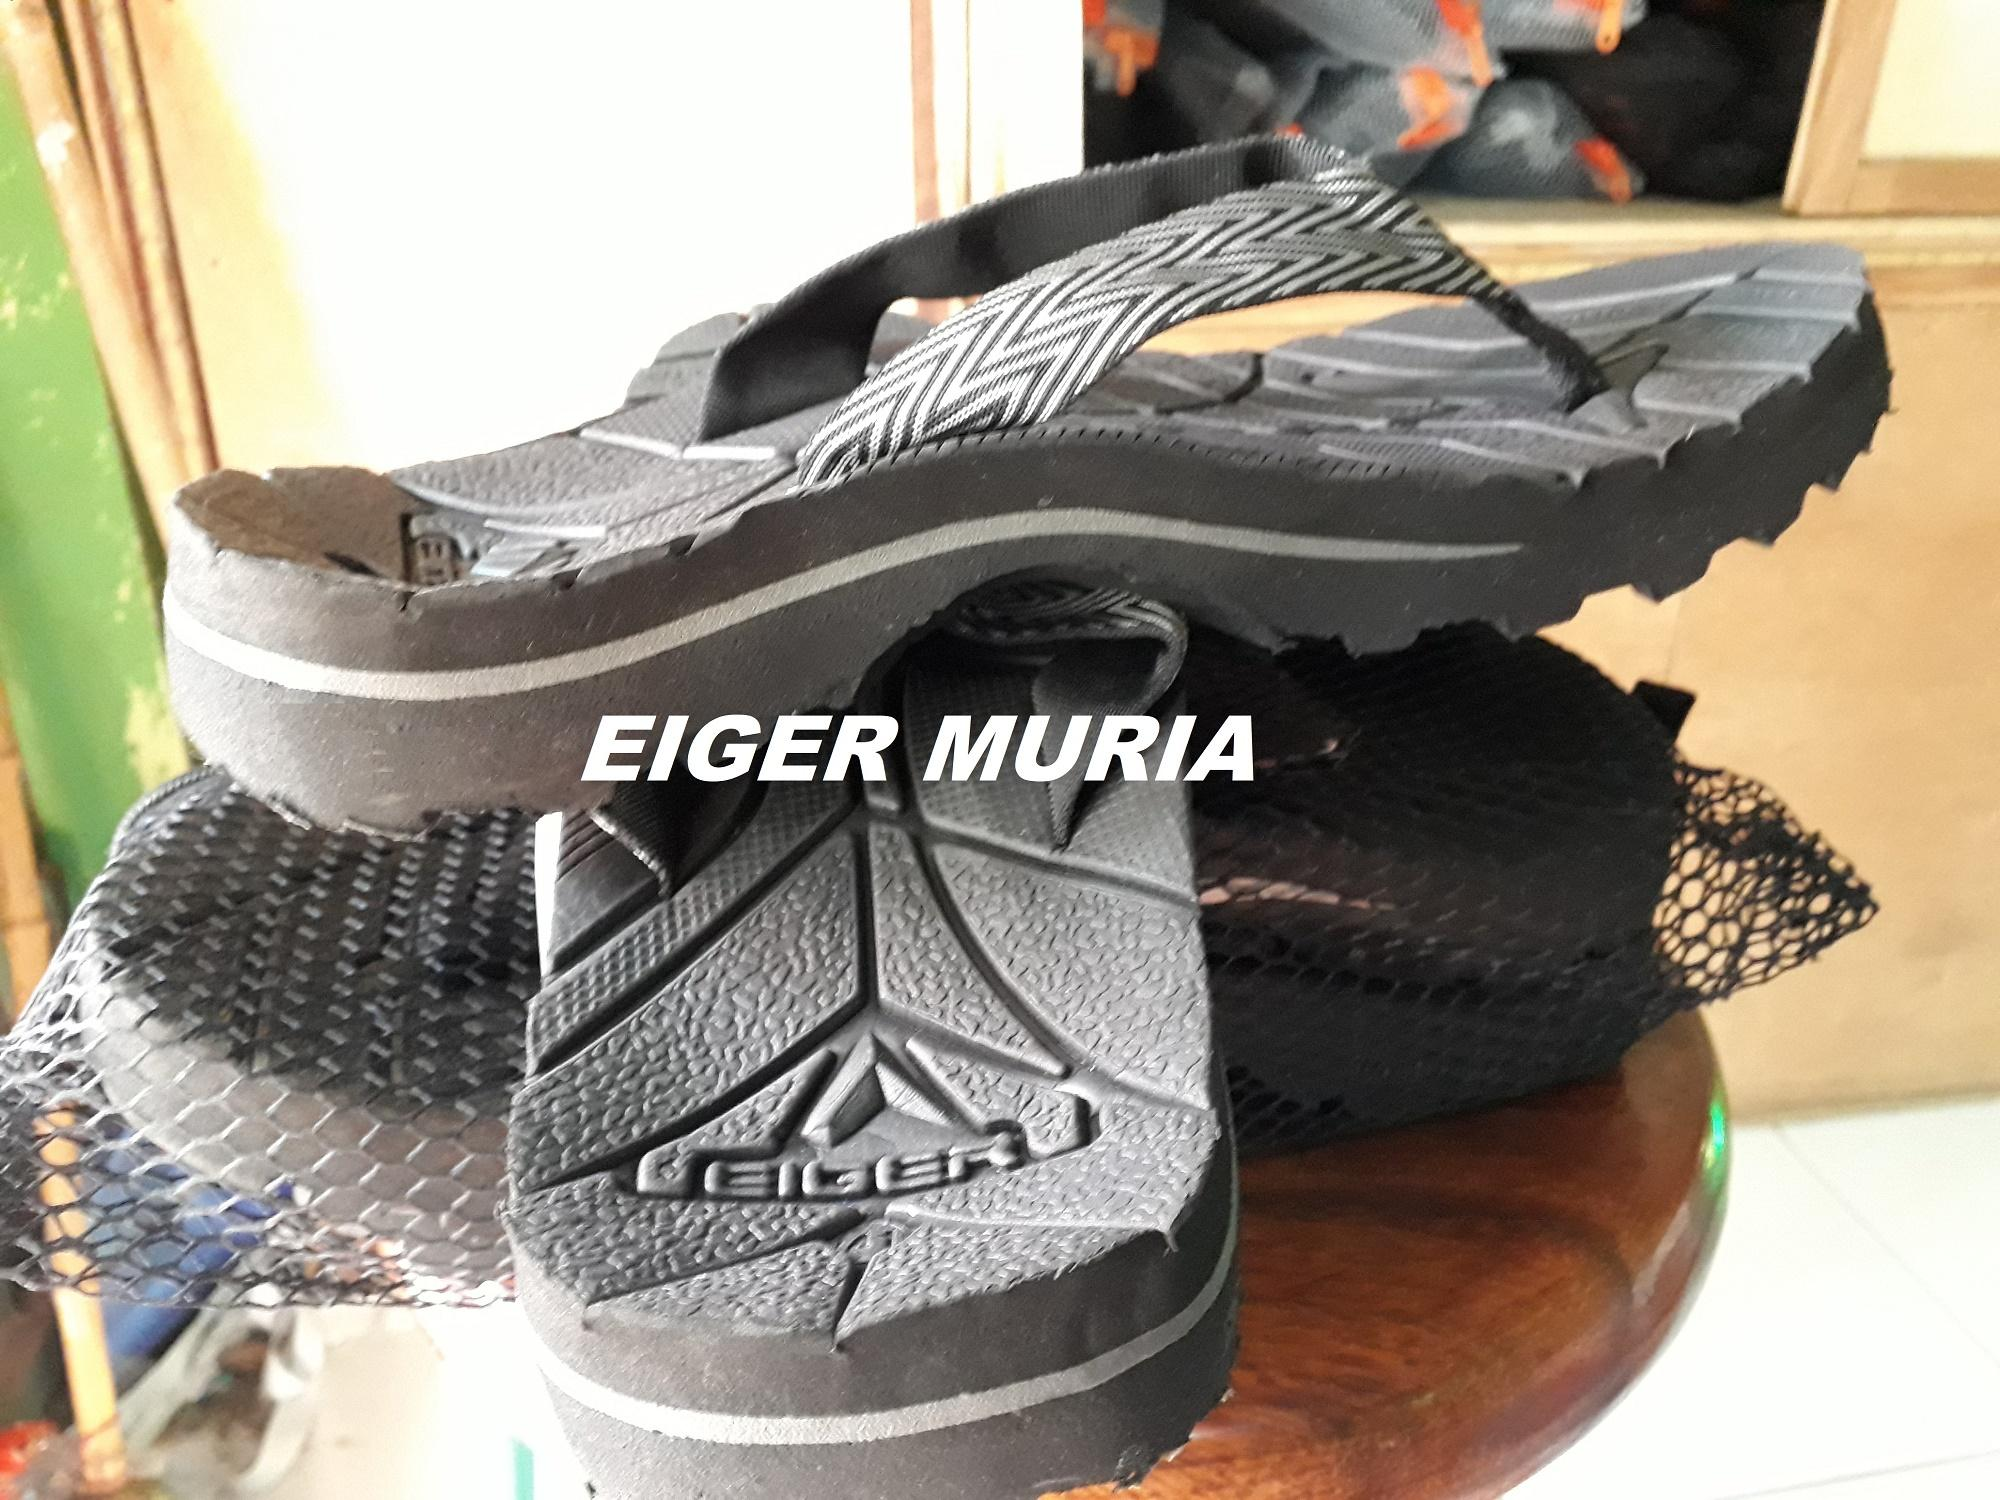 Kelebihan Promo Sandal Gunung Eiger Kinkajou Japit Jepit Hitam Polos Detail Gambar Terbaru